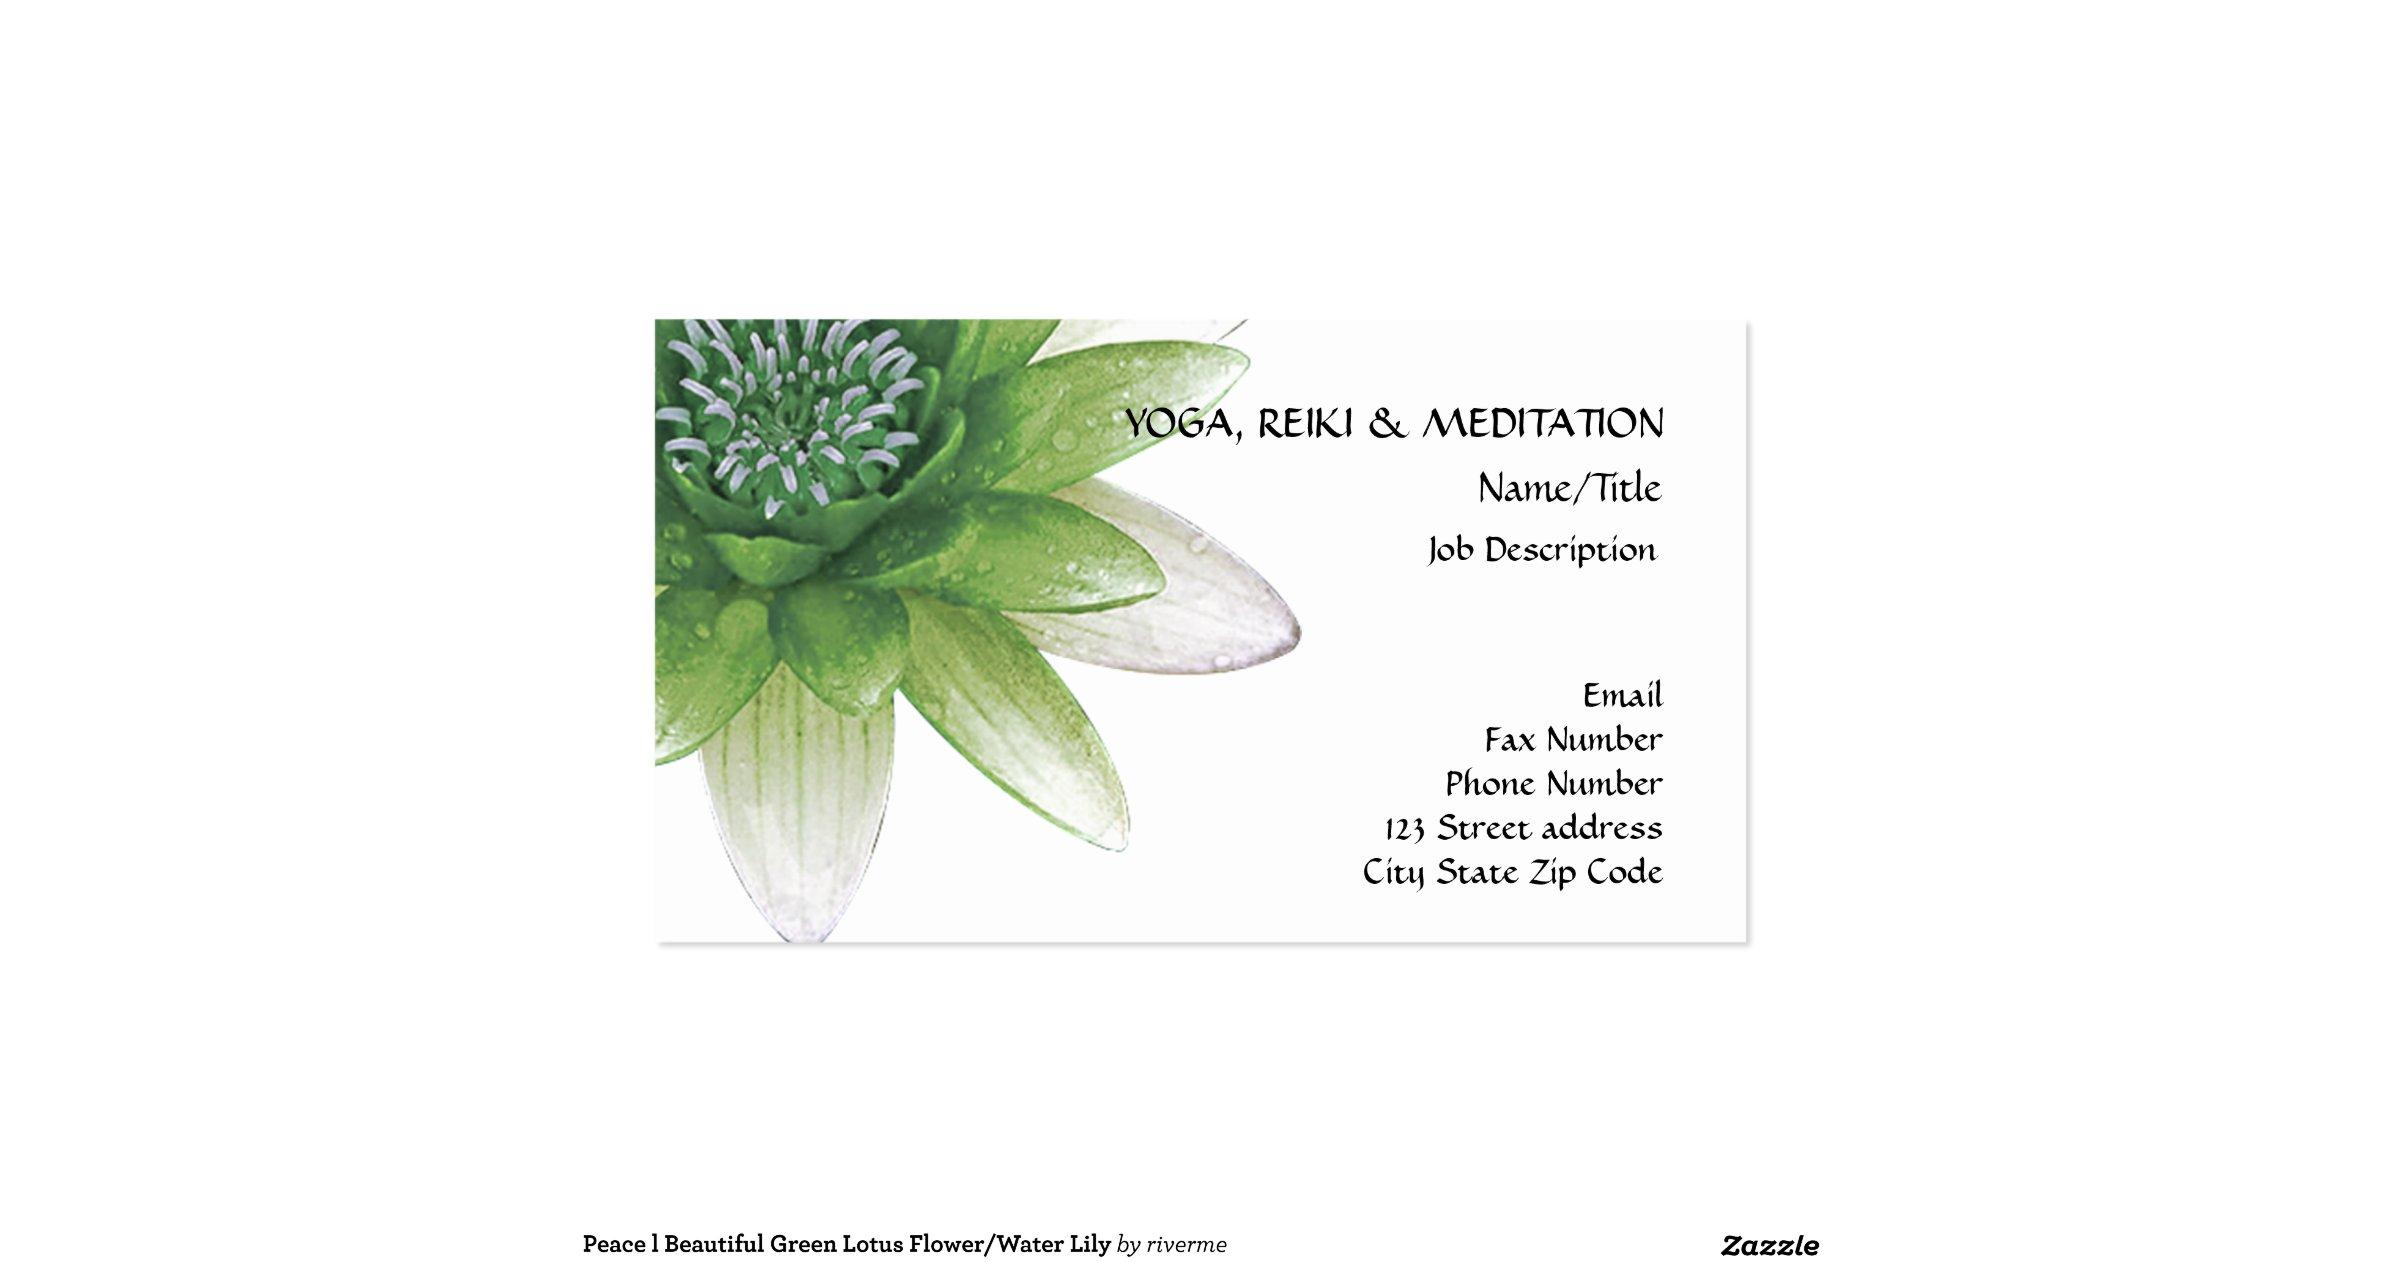 Snap peace l beautiful blue lotus flower business card zazzle photos peace l beautiful green lotus flowerwater lily pack of standard business cards zazzle colourmoves